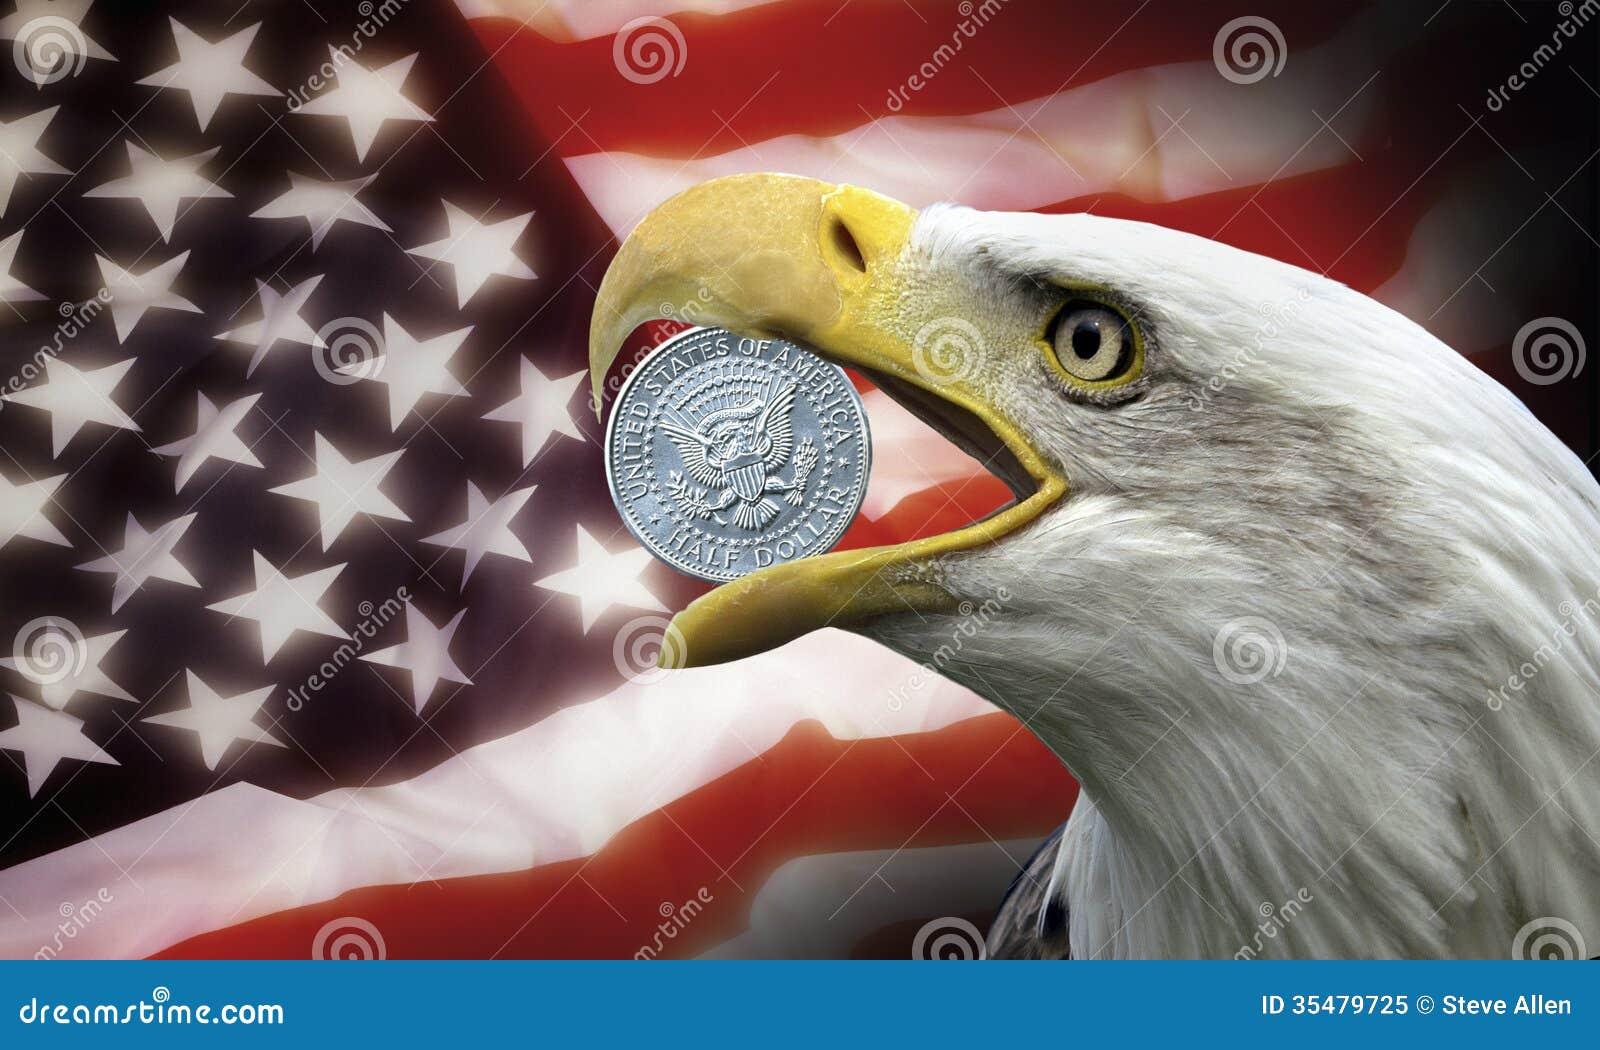 Supremacy Of US Dollar